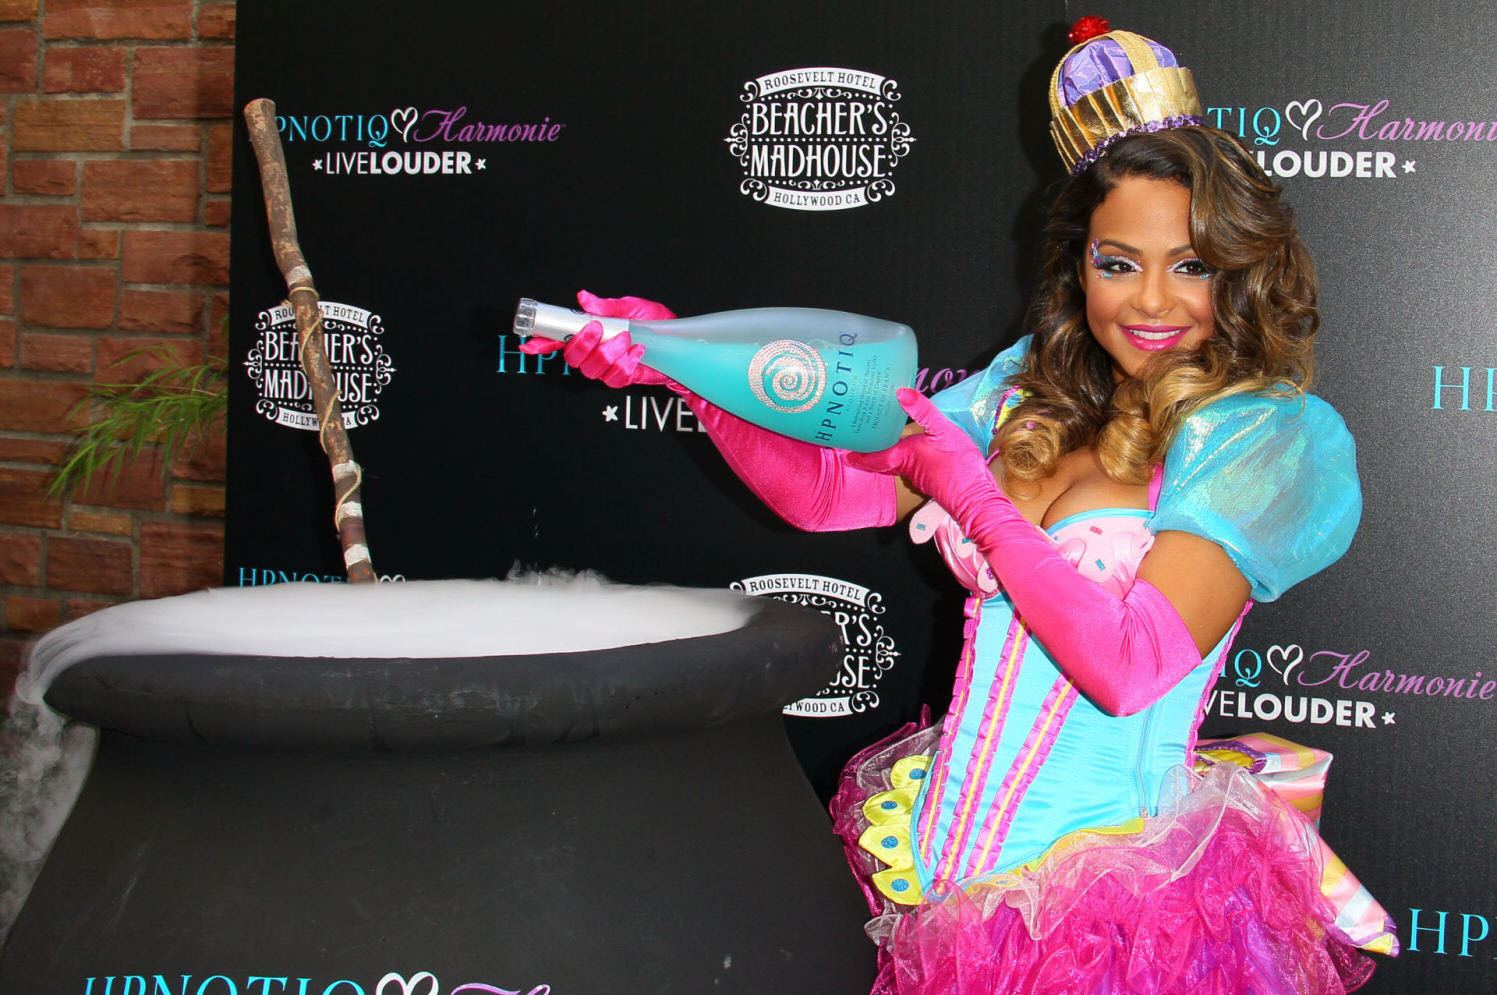 http://1.bp.blogspot.com/-YIjUMqct09A/UKOZn7QRJzI/AAAAAAAAk1o/06h3d1yYHFI/s1600/Christina+Milian+-+Launch+of+her+Halloween+cocktail+recipe+in+Hollywood+-+October+26%252C+2012+12.jpg